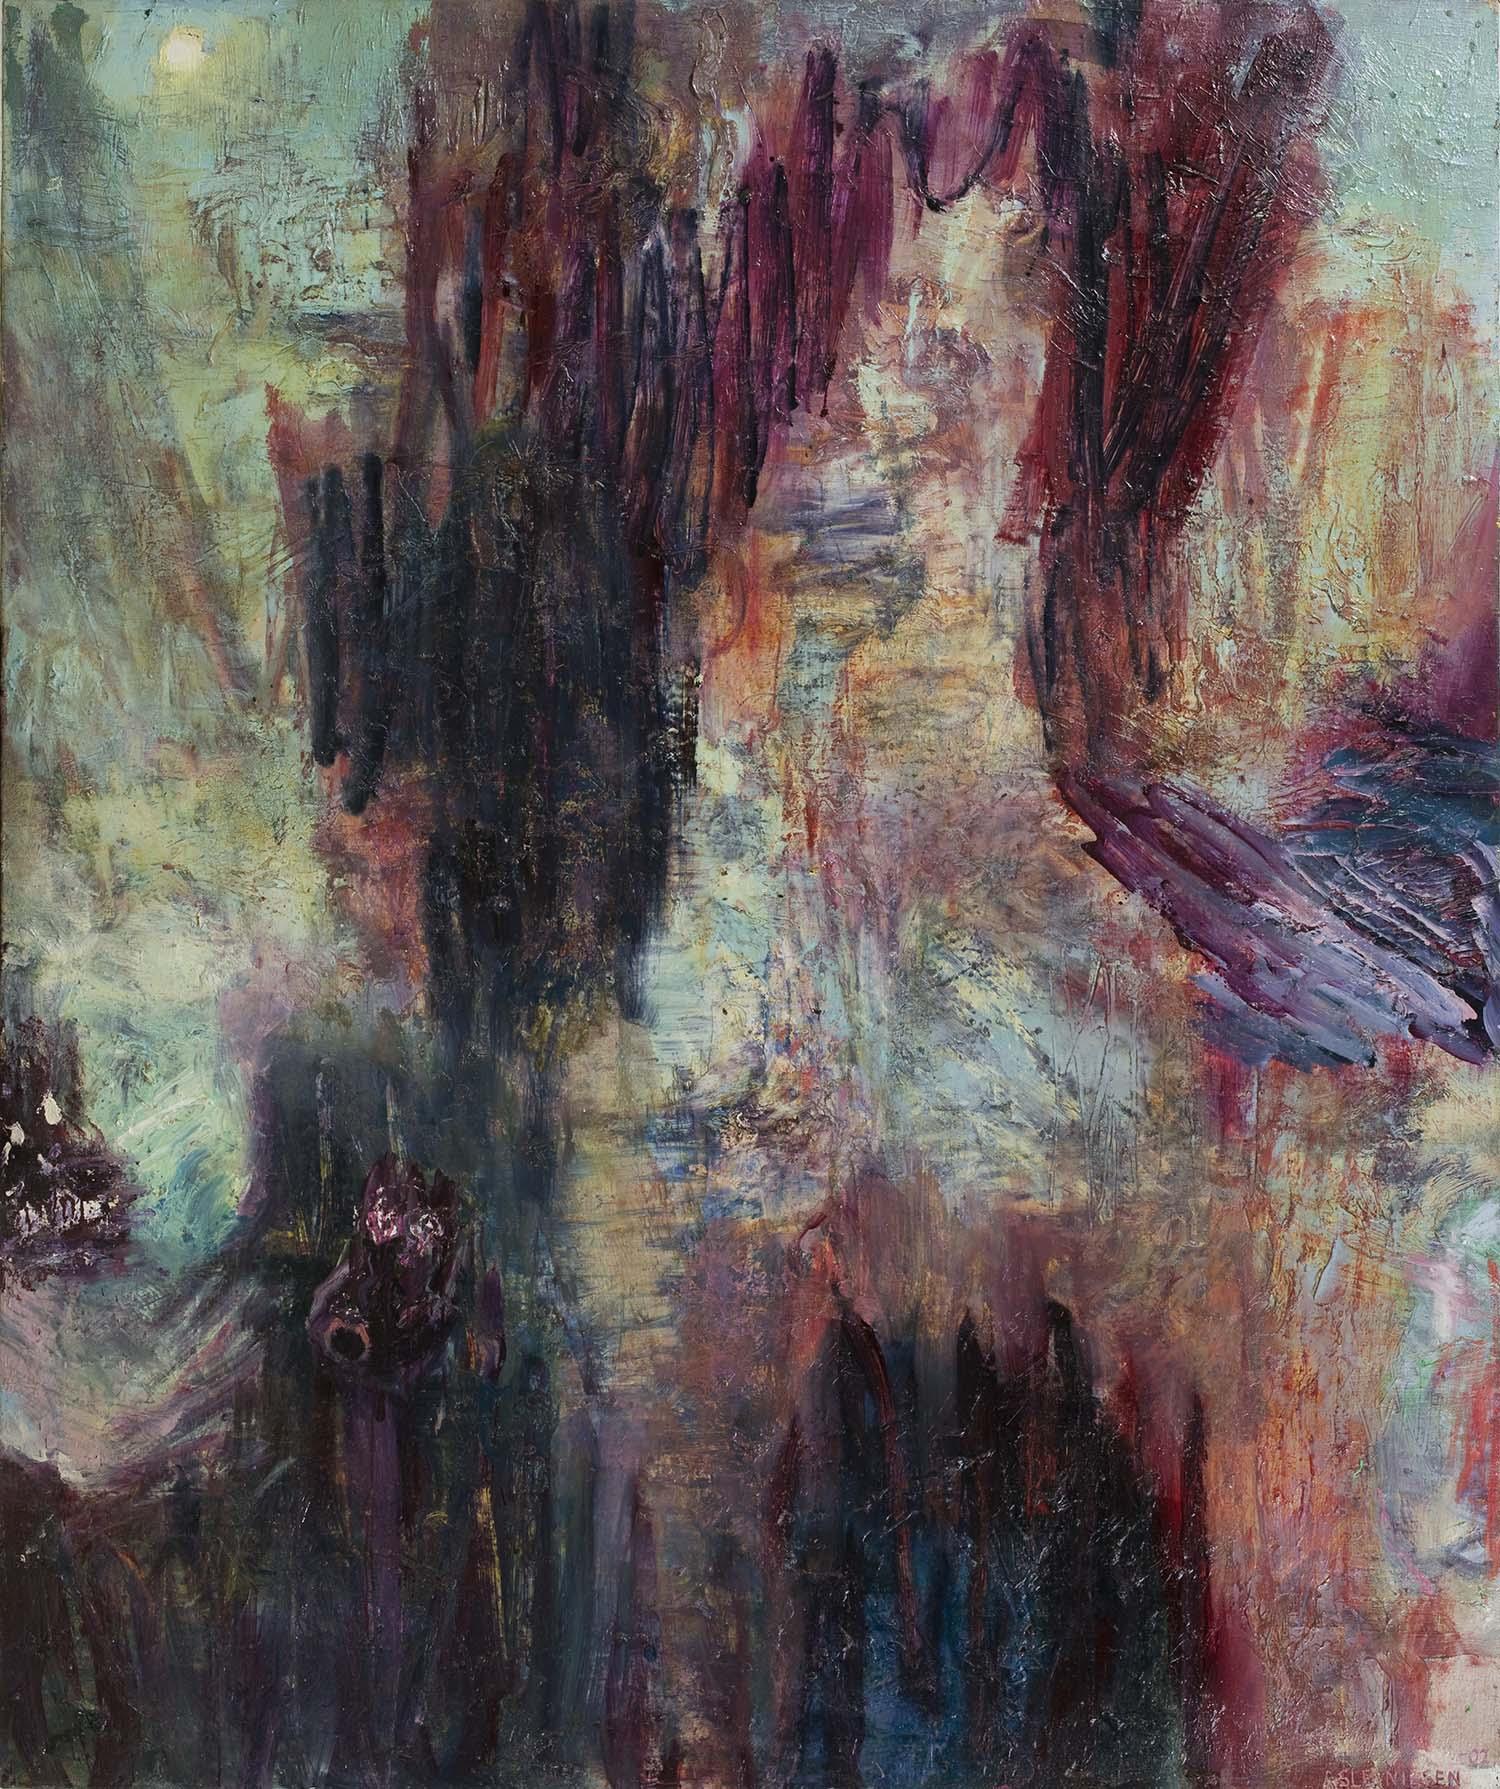 Oil on canvas. 220 x 200 cm